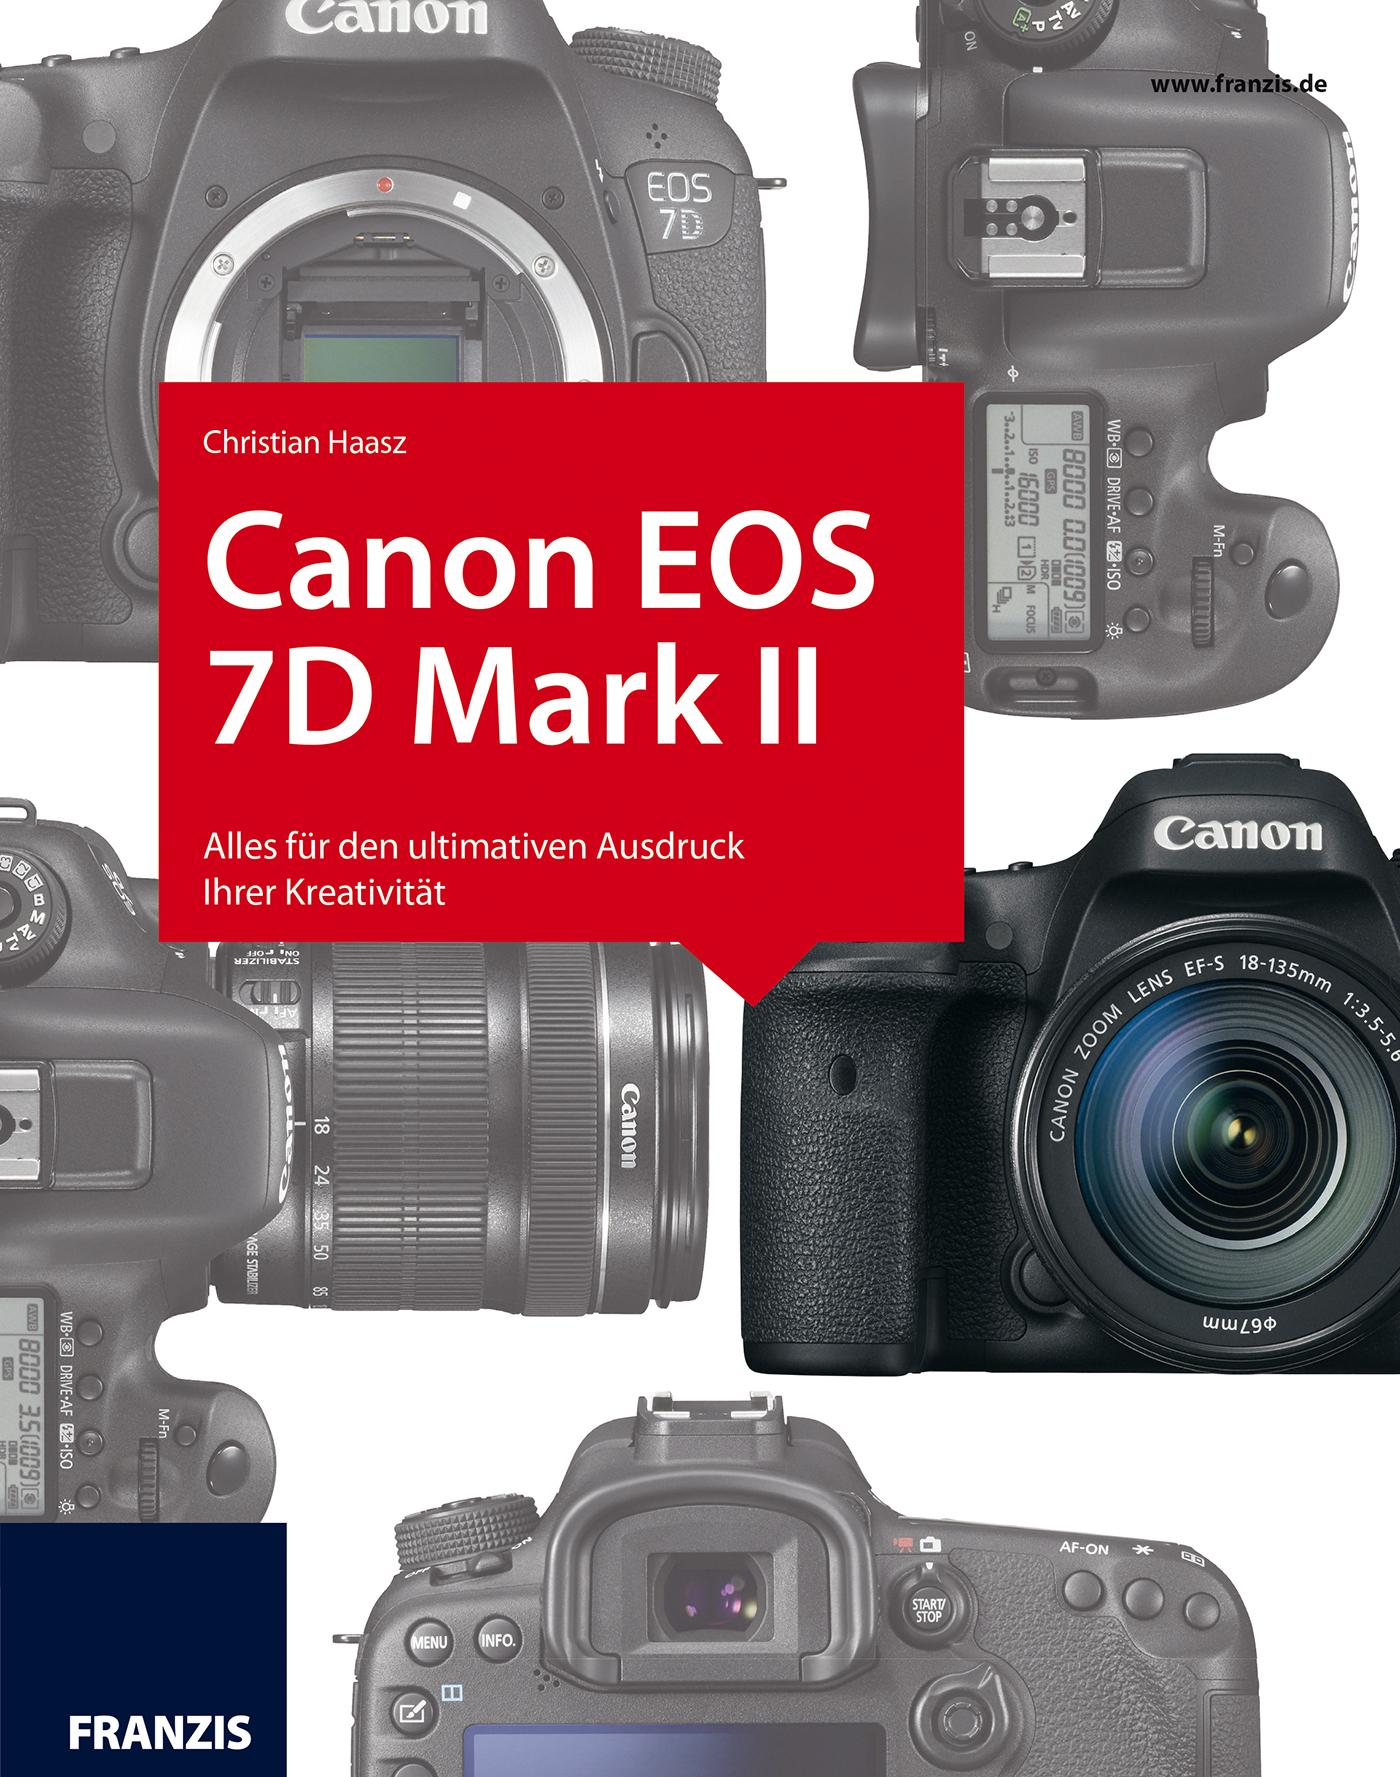 лучшая цена Christian Haasz Kamerabuch Canon EOS 7D Mark II